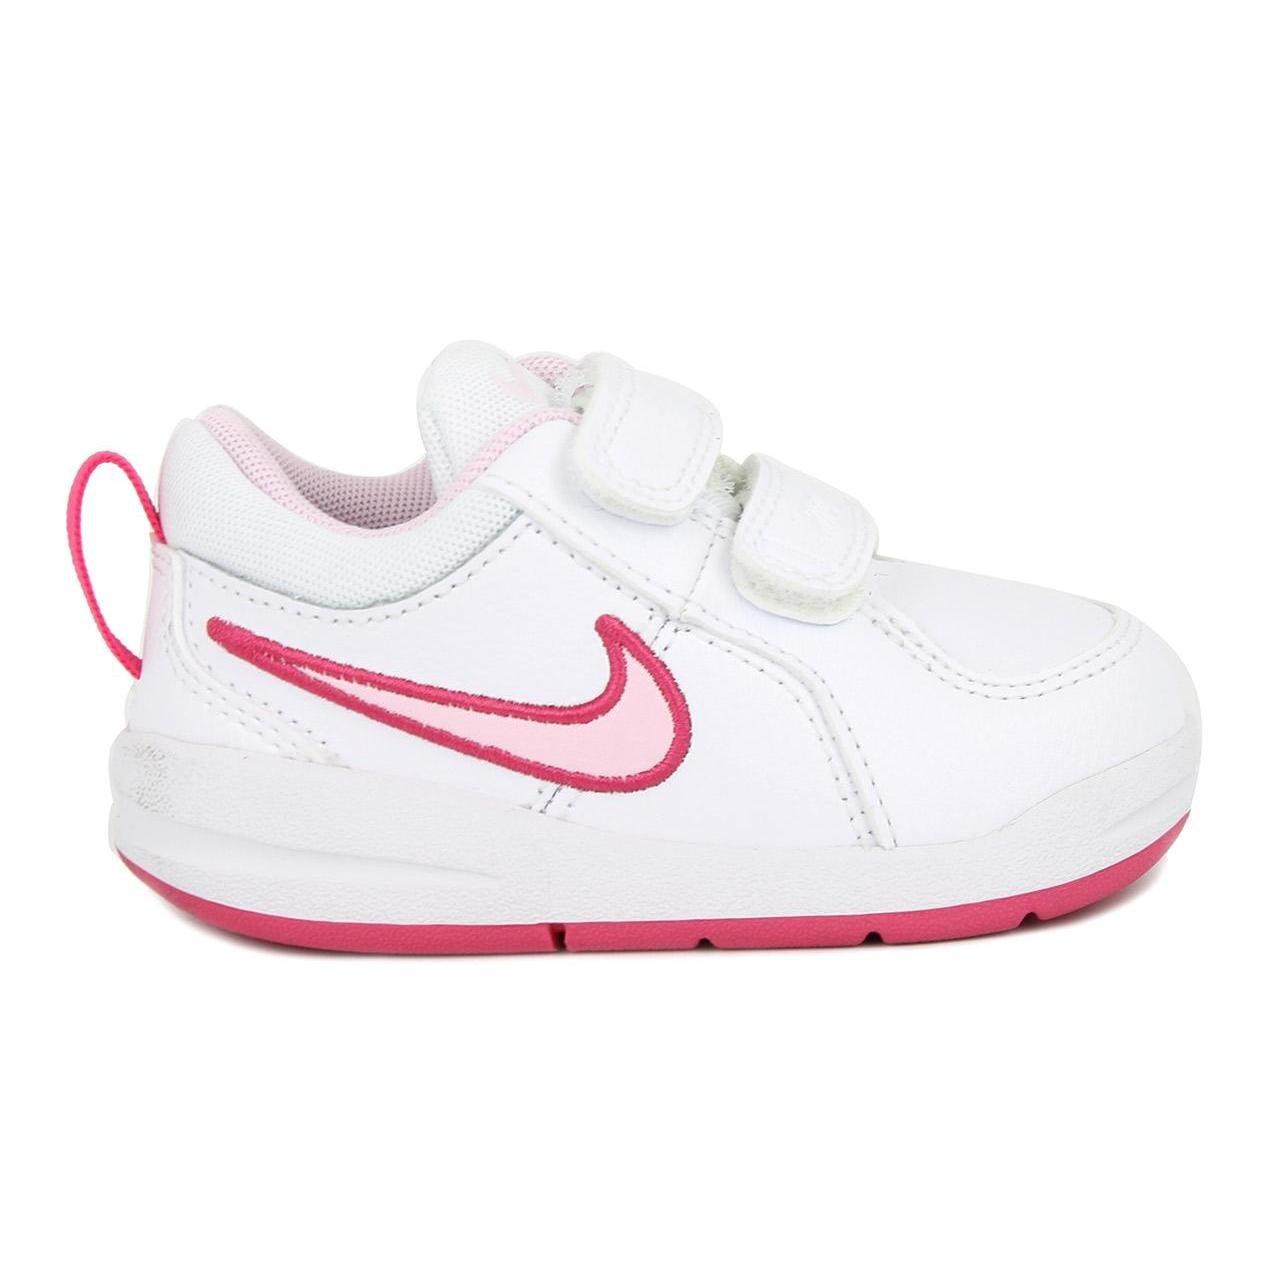 TDV Nike Pico 4 Toddler Girls Sneakers Shoes